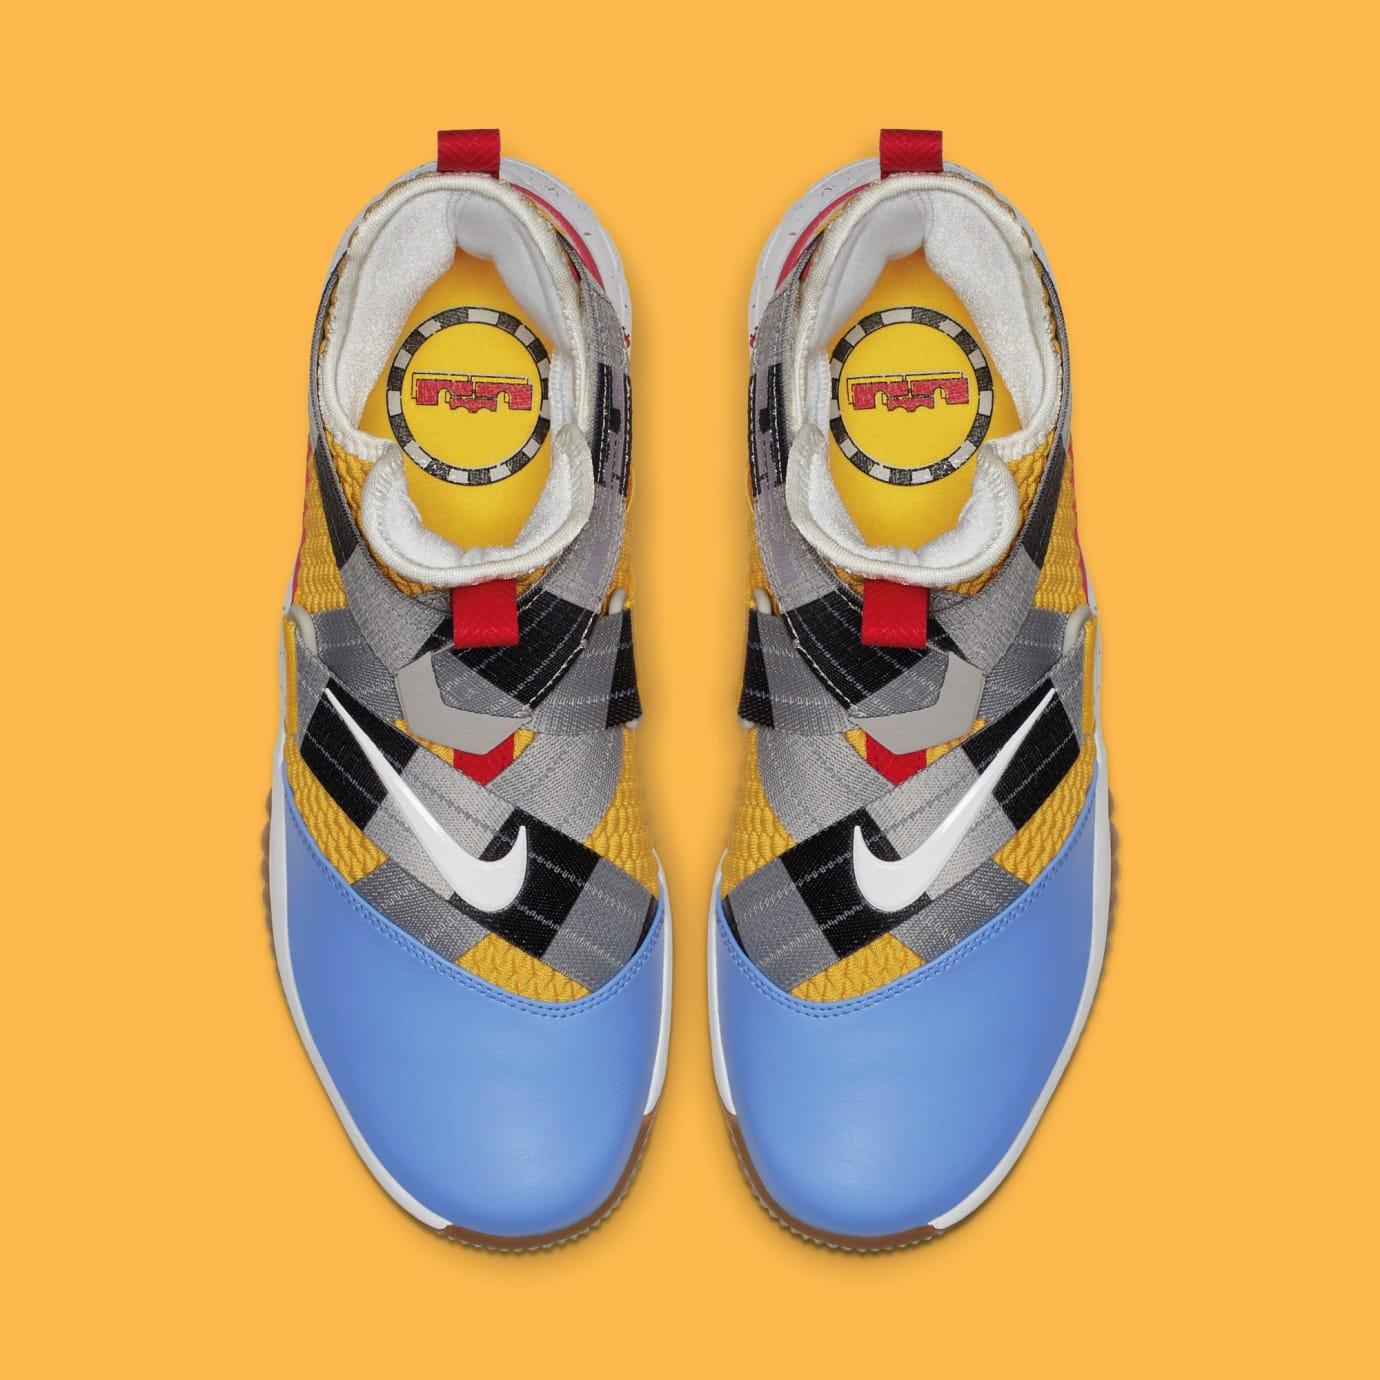 online store 4cdc8 cb106 Image via Nike Nike LeBron Soldier 12 FlyEase  Arthur  AV3812-700 (Top)